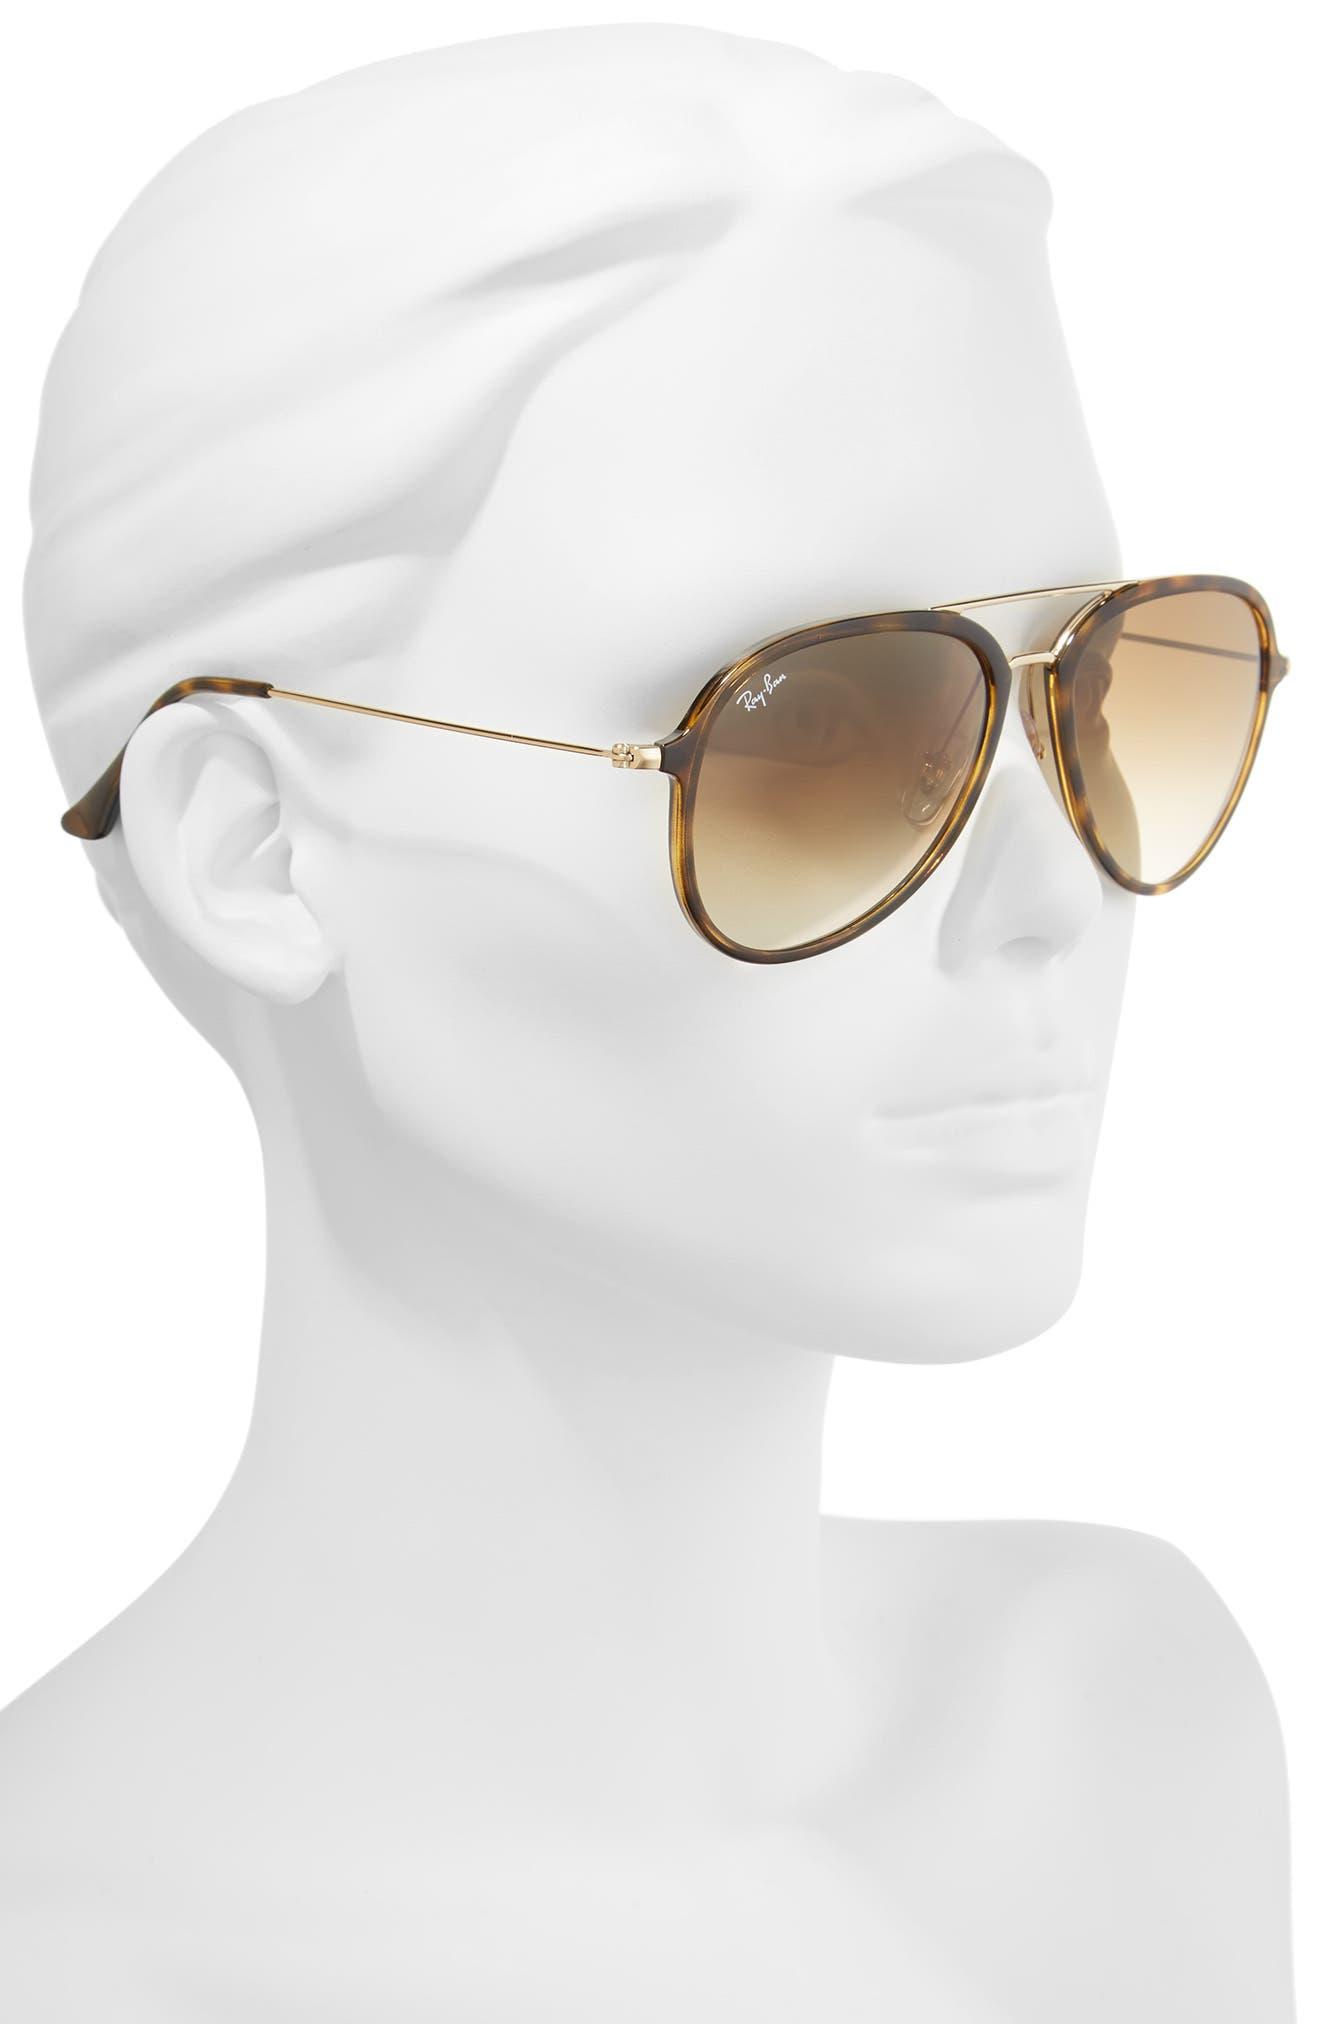 57mm Pilot Sunglasses,                             Alternate thumbnail 2, color,                             LIGHT HAVANA